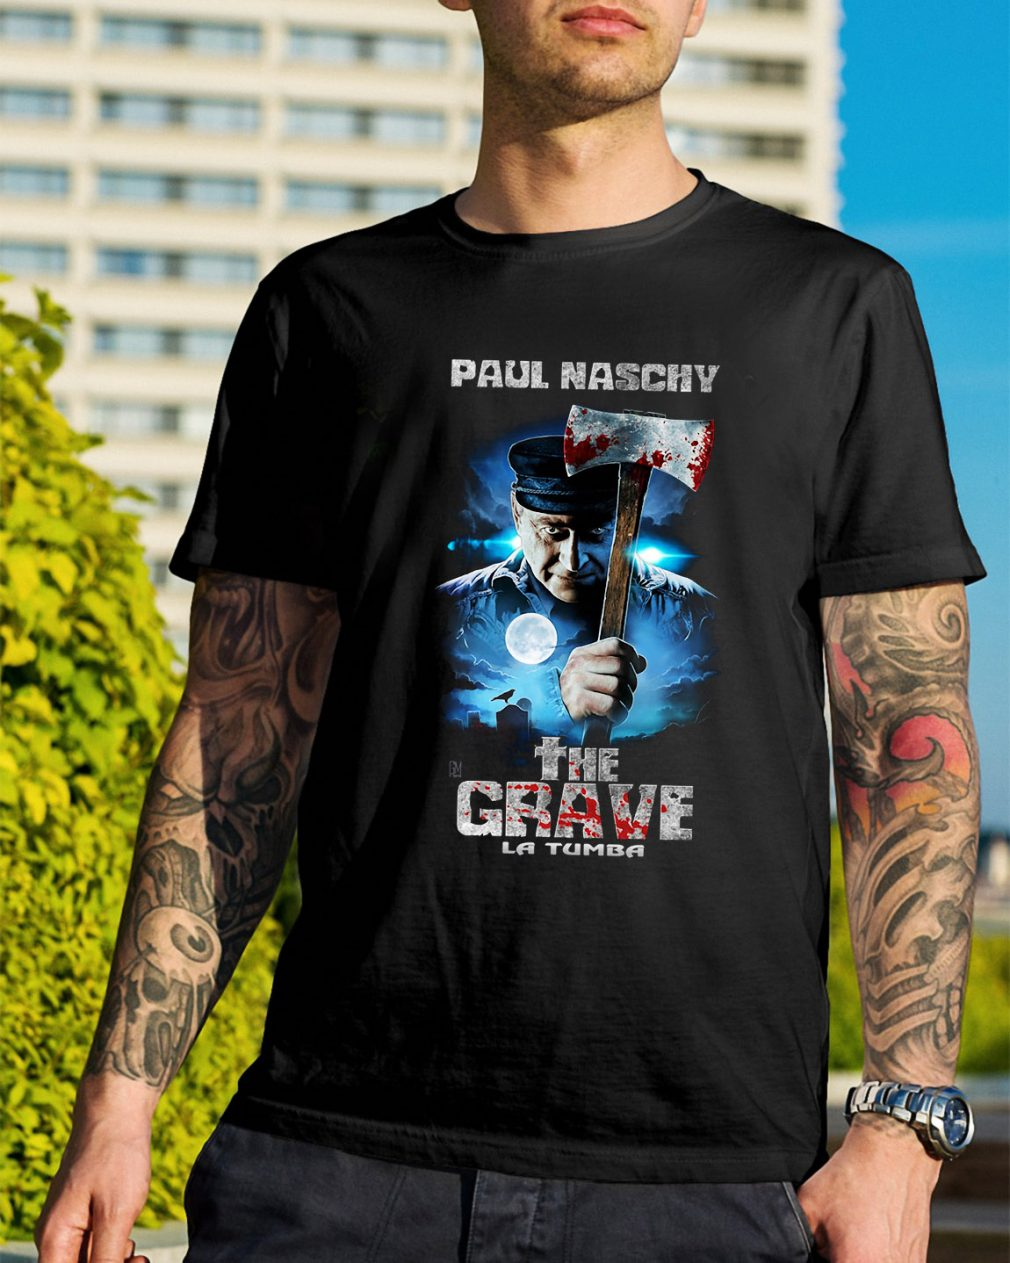 Paul Naschy the Grave La Tumba shirt